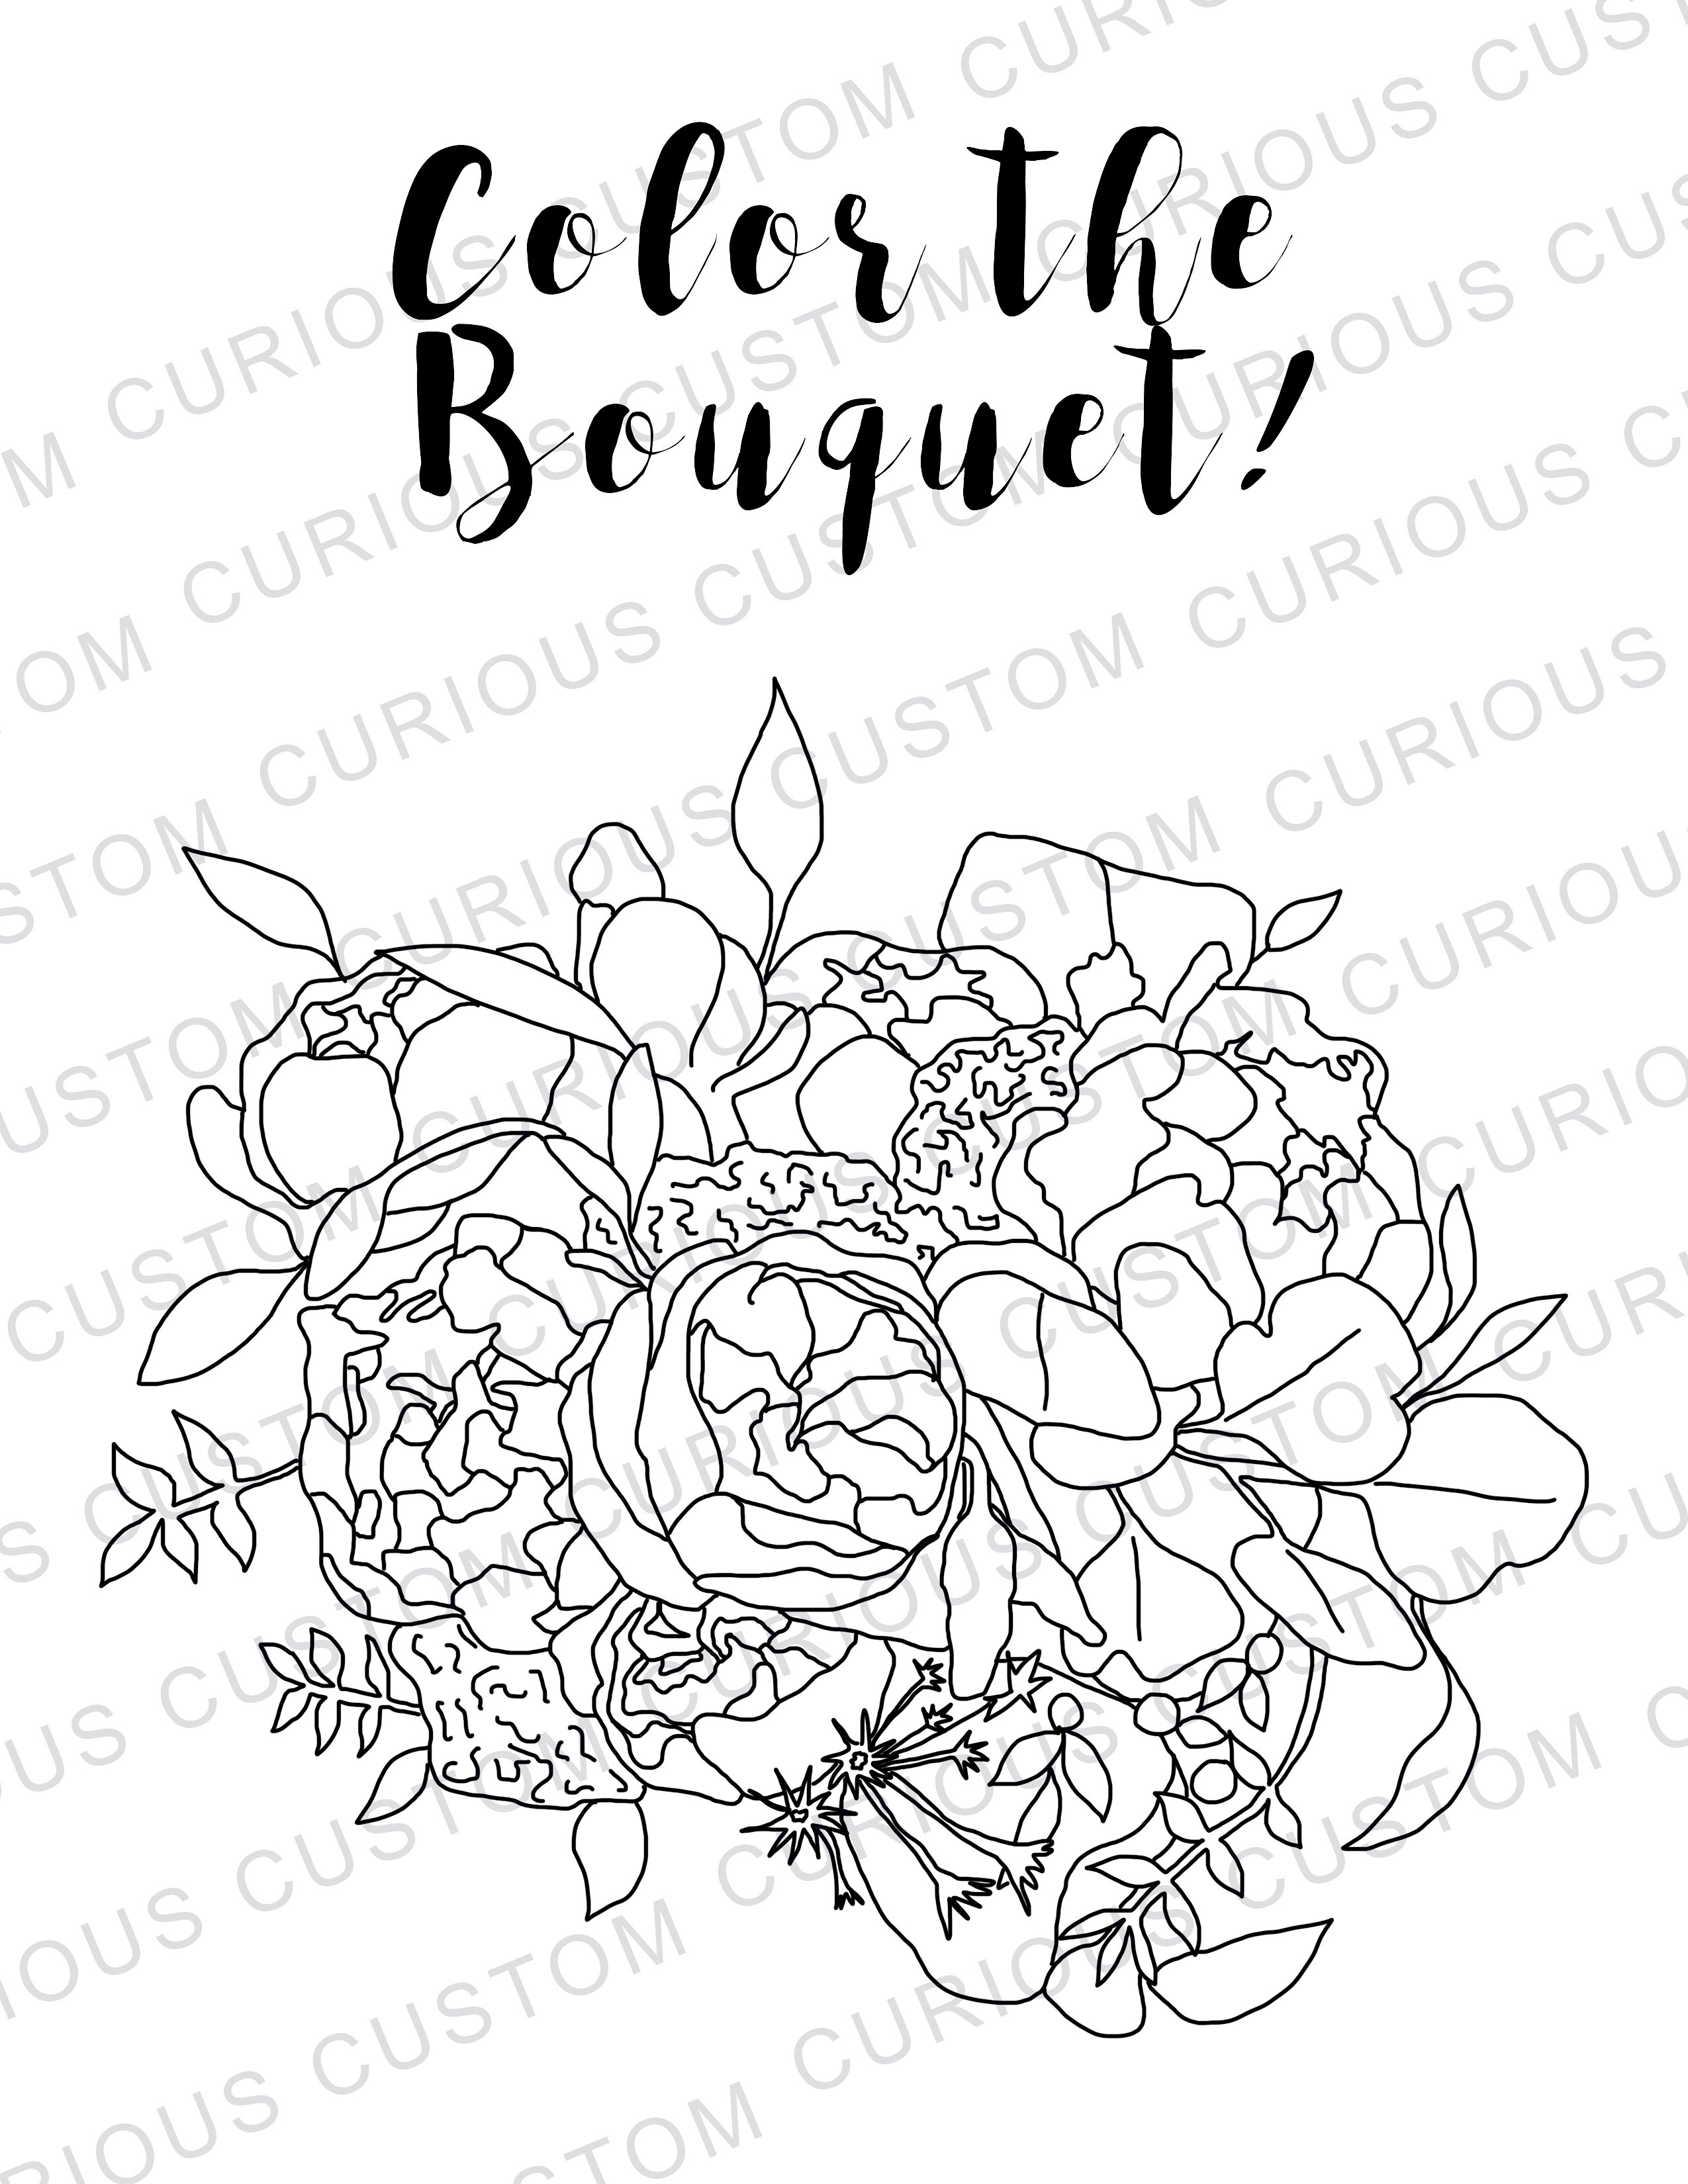 Custom Coloring Books | United States | Curious Custom ...